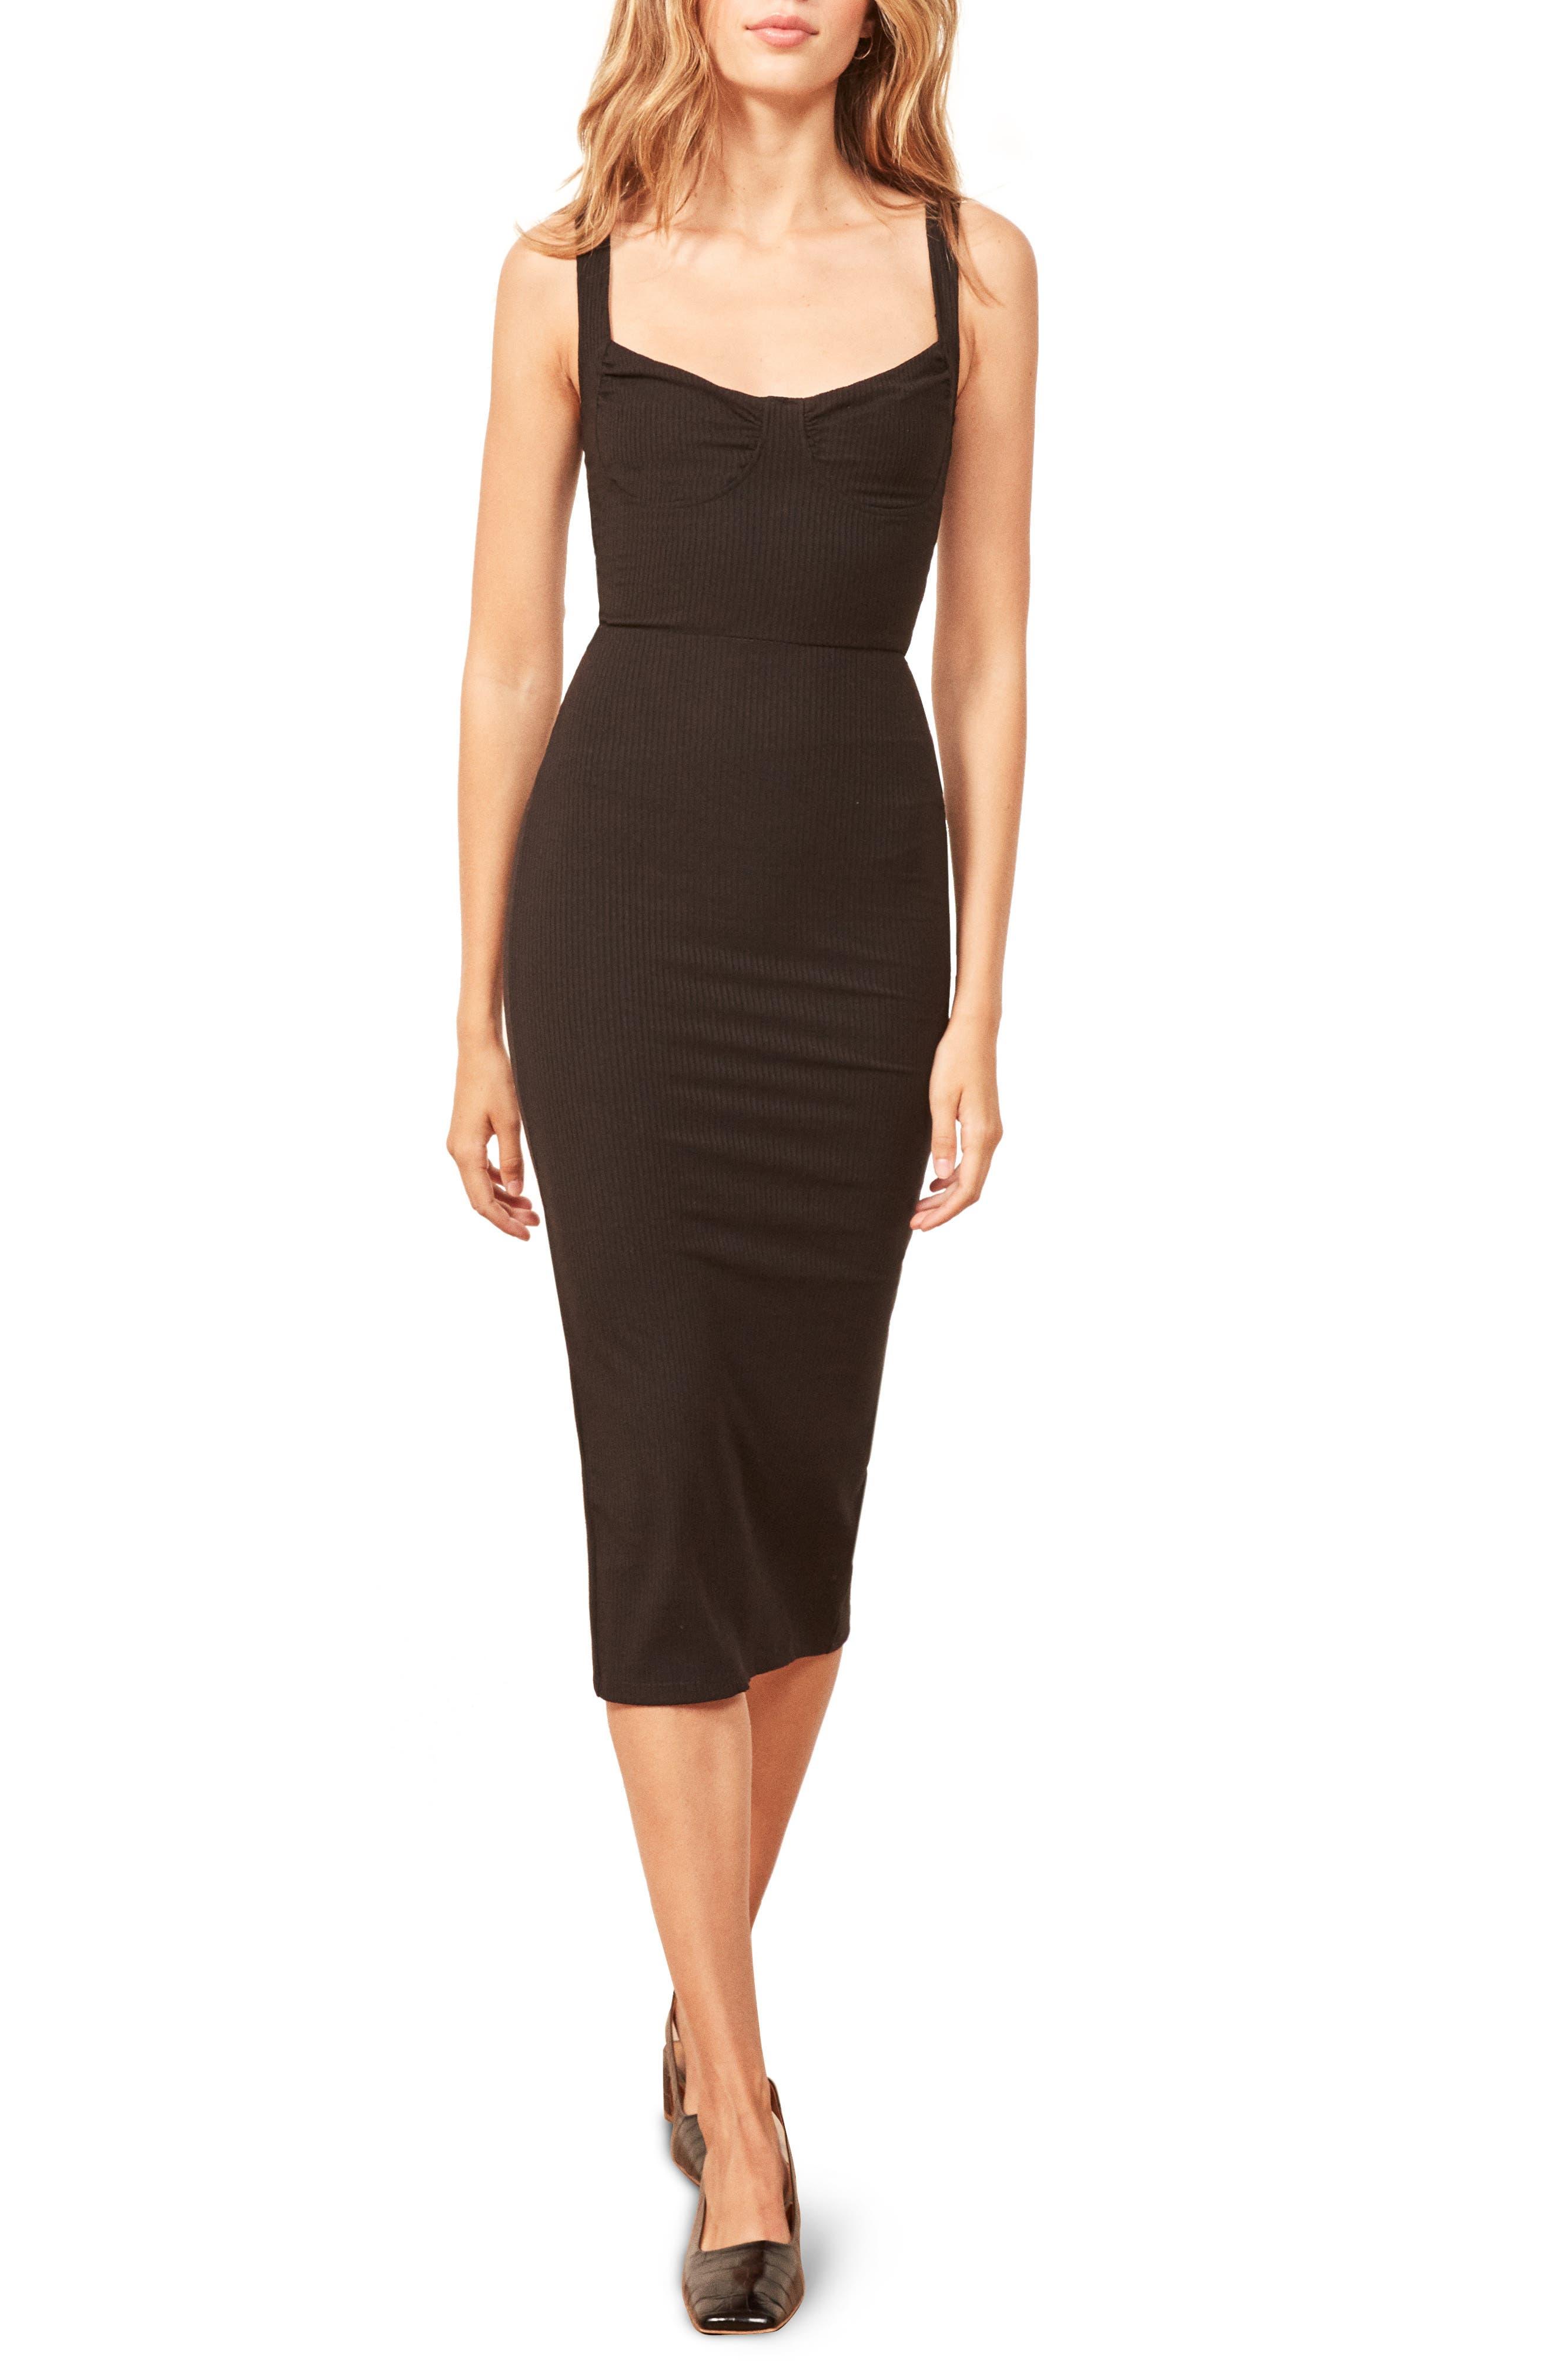 Adrian Sweetheart Neck Body-Con Dress,                             Main thumbnail 1, color,                             BLACK